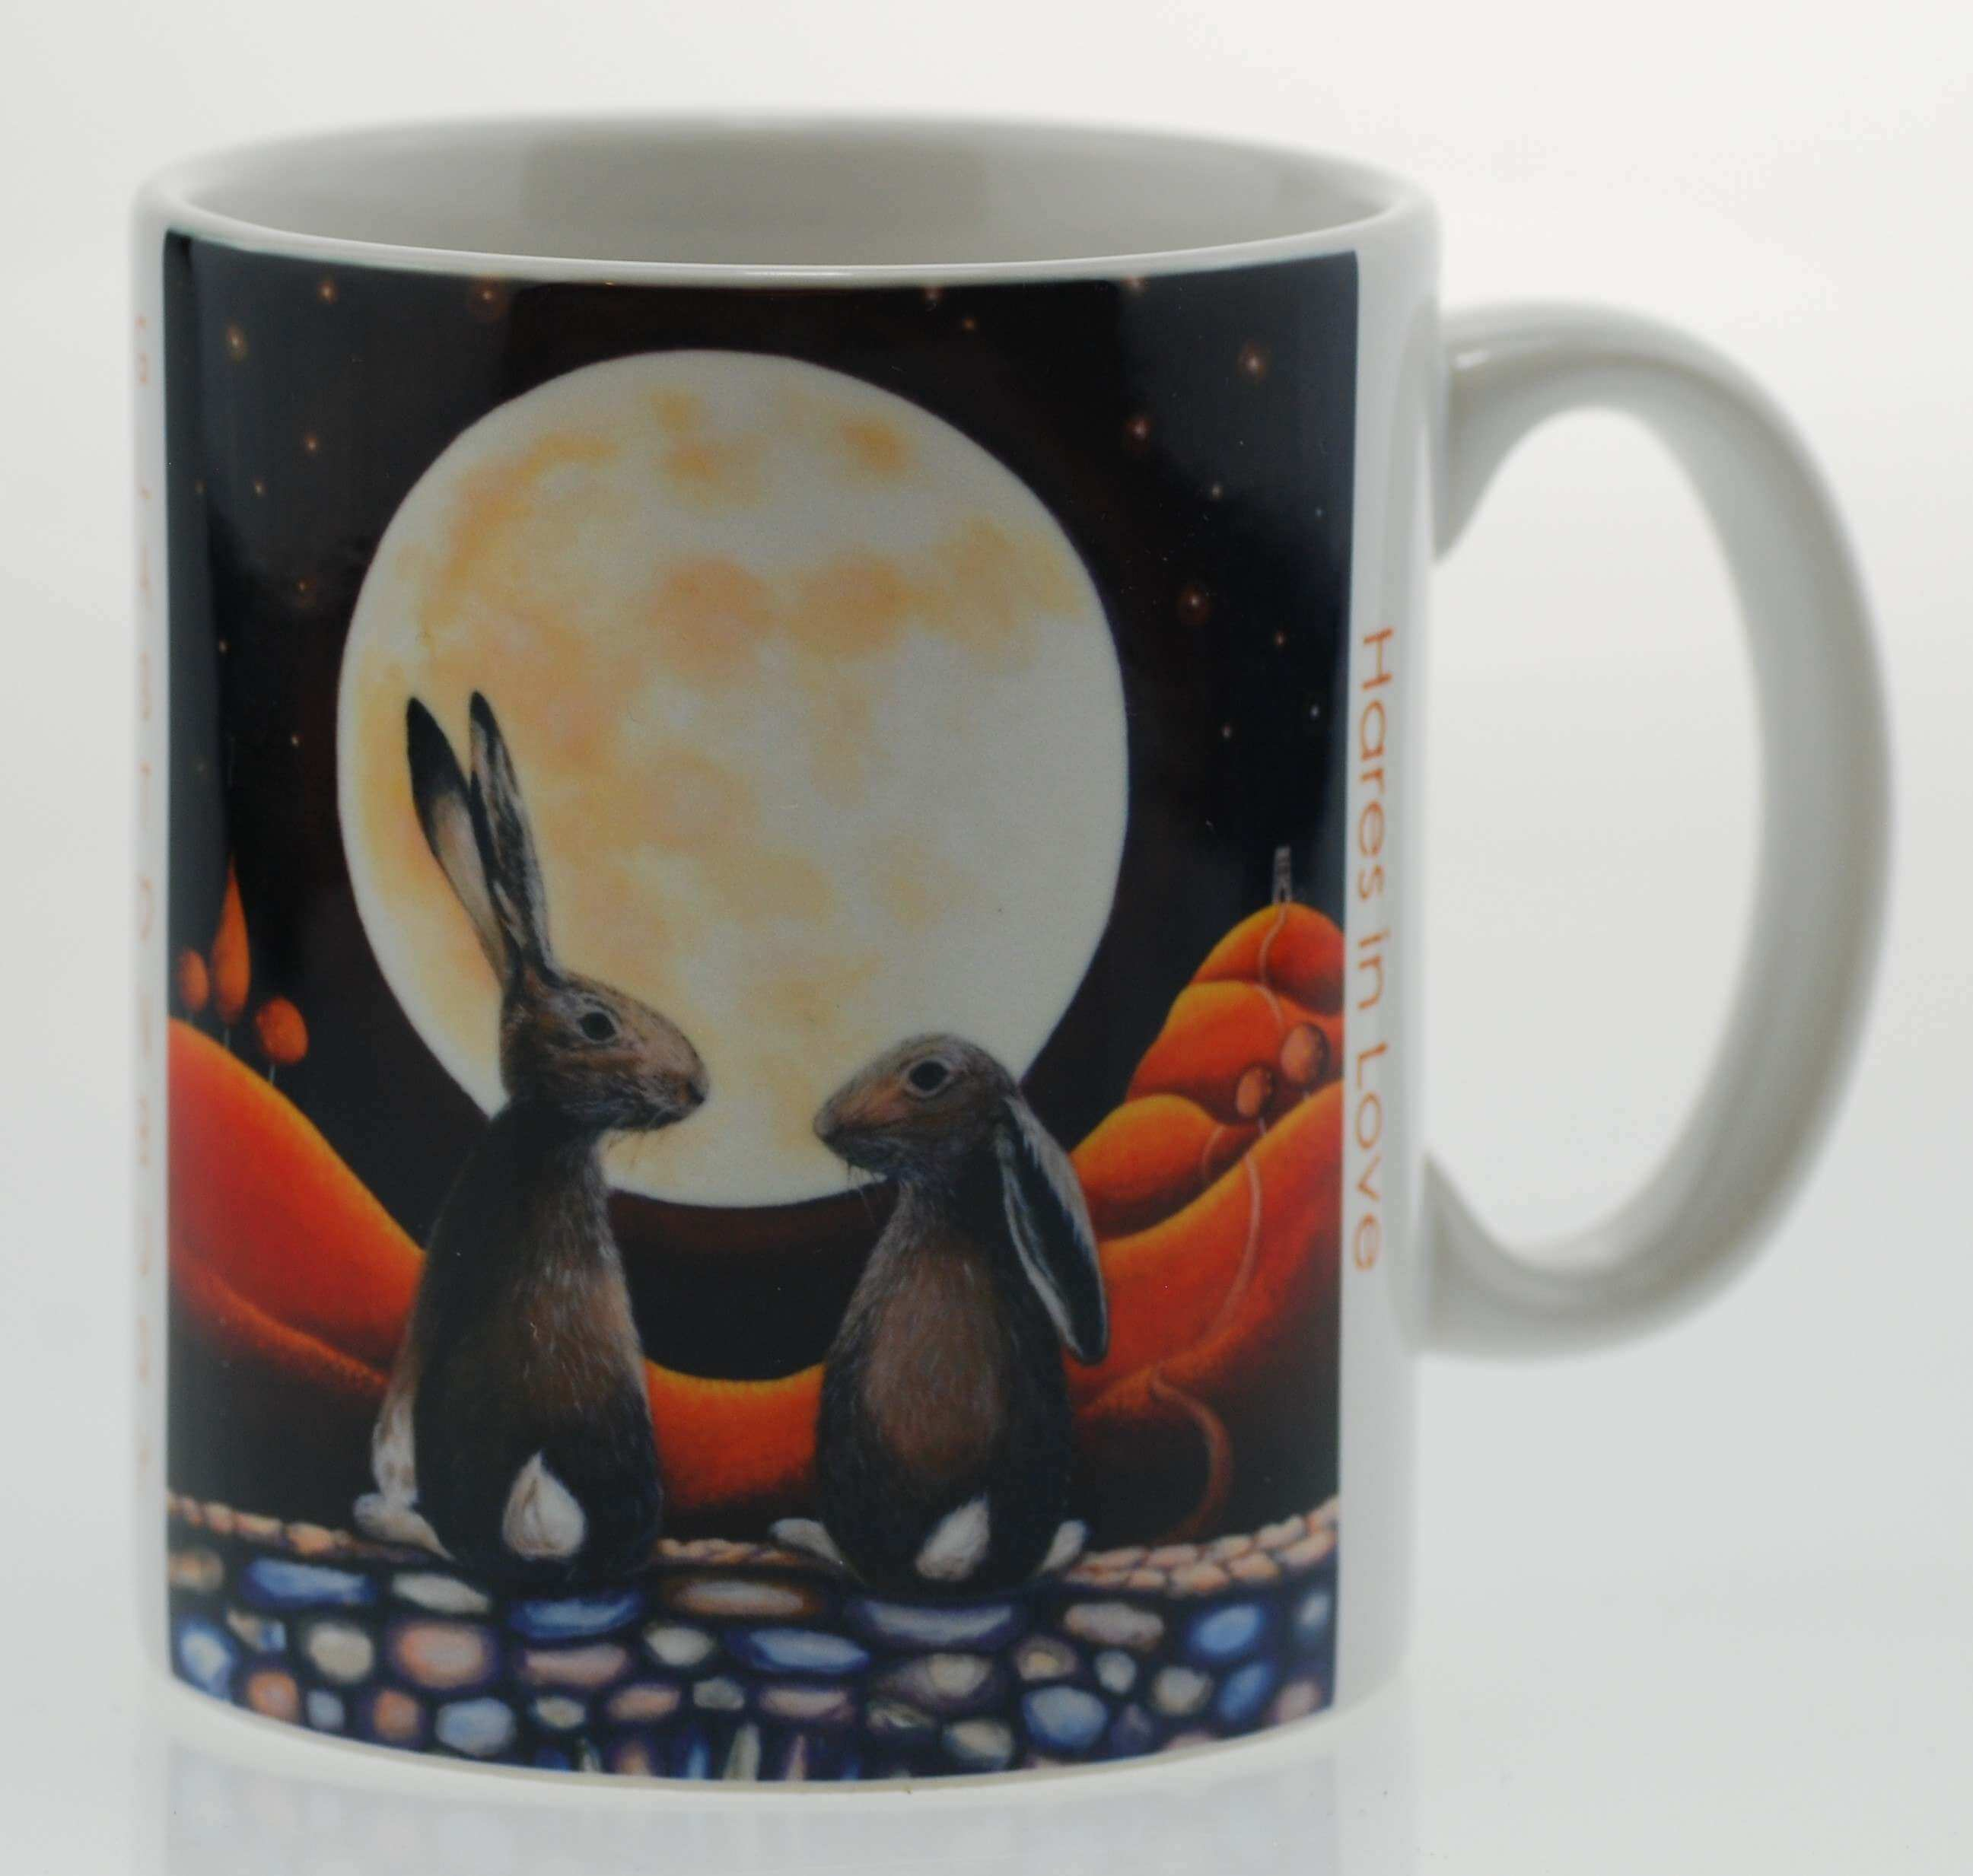 Hares in Love Mug